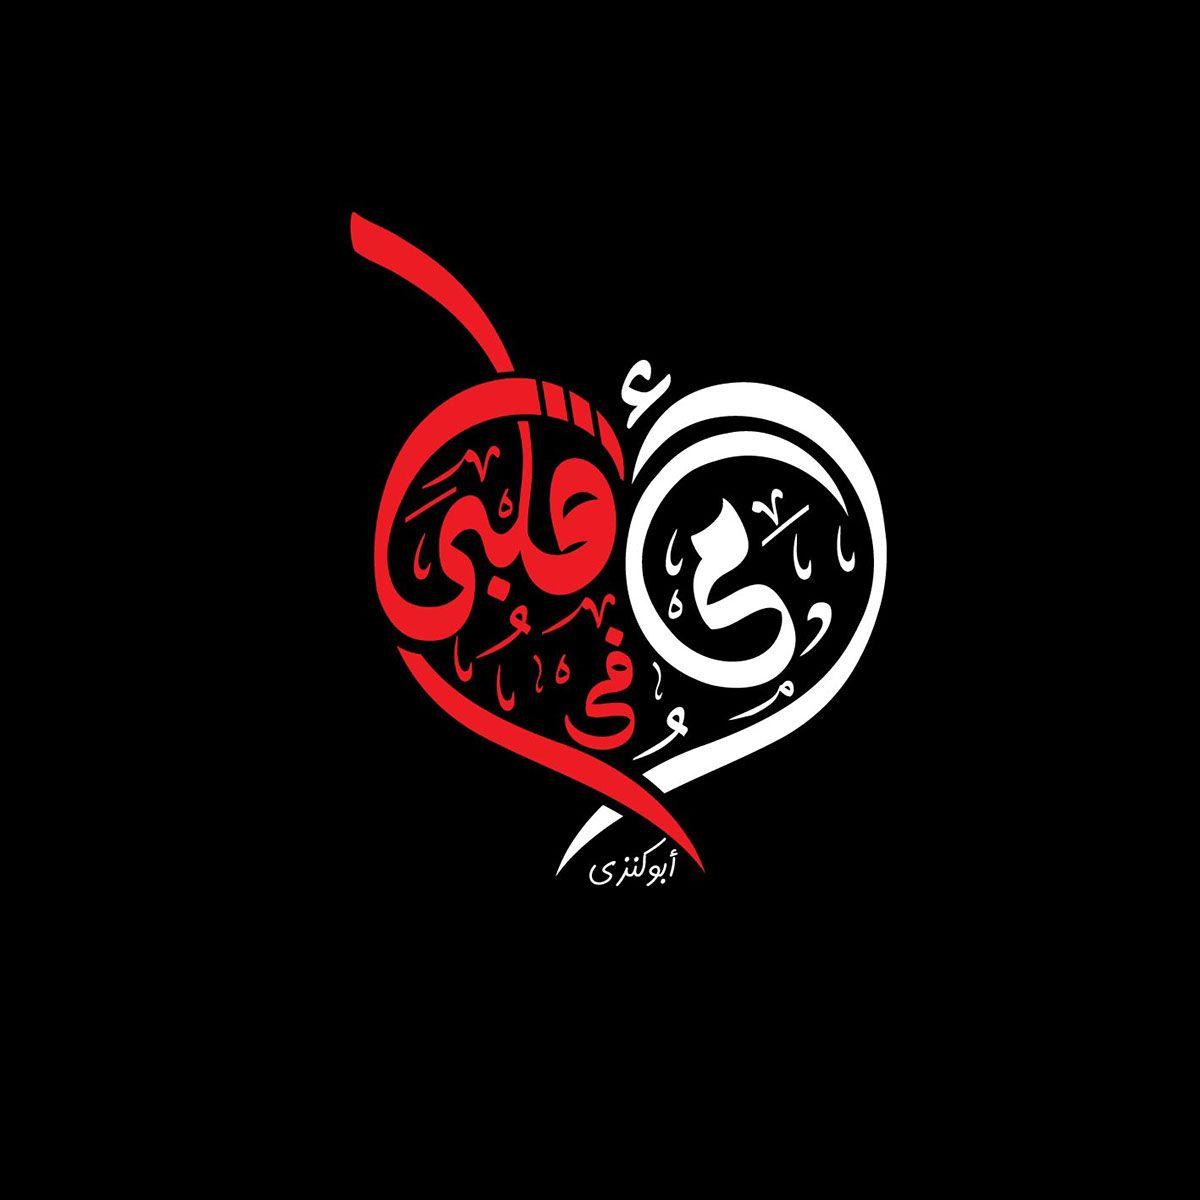 أمى فى قلبى On Behance Calligraphy Art Islamic Art Calligraphy Caligraphy Art